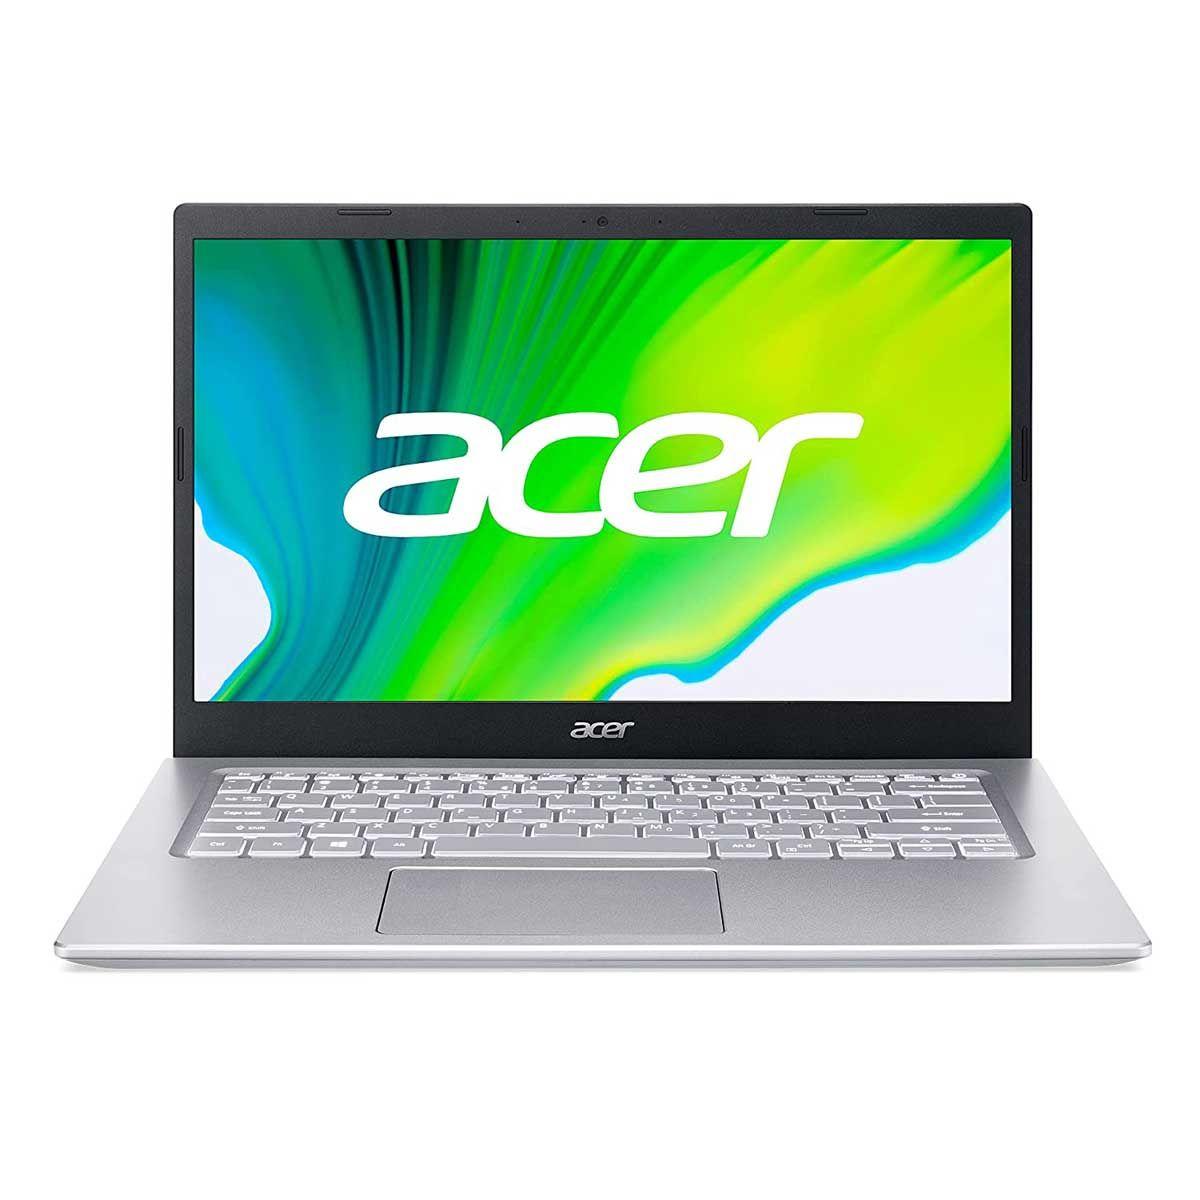 Acer Aspire 5 11th Gen Core i3-1115G4 (2021)